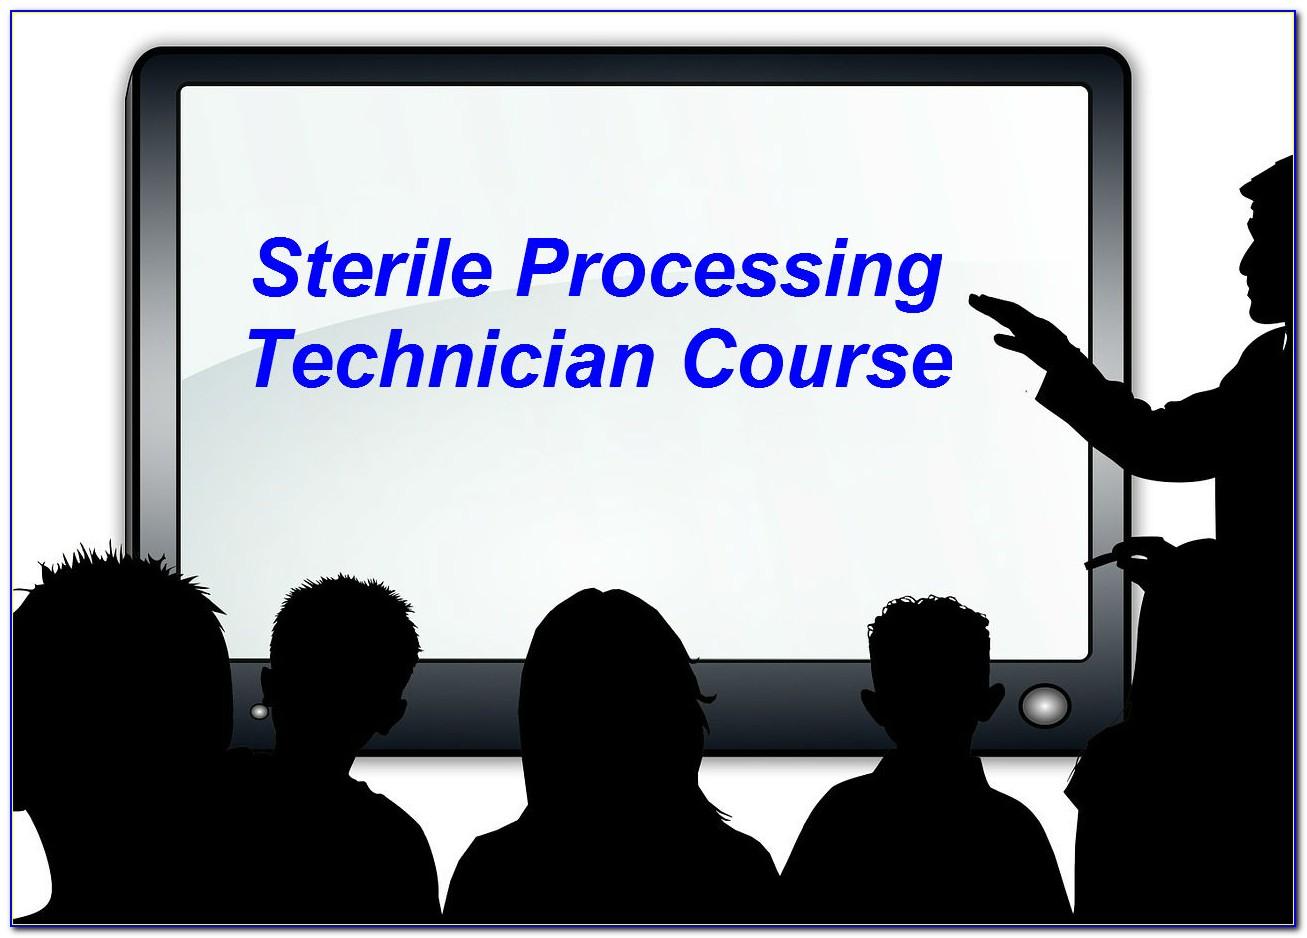 Sterile Processing Technician Certification Exam